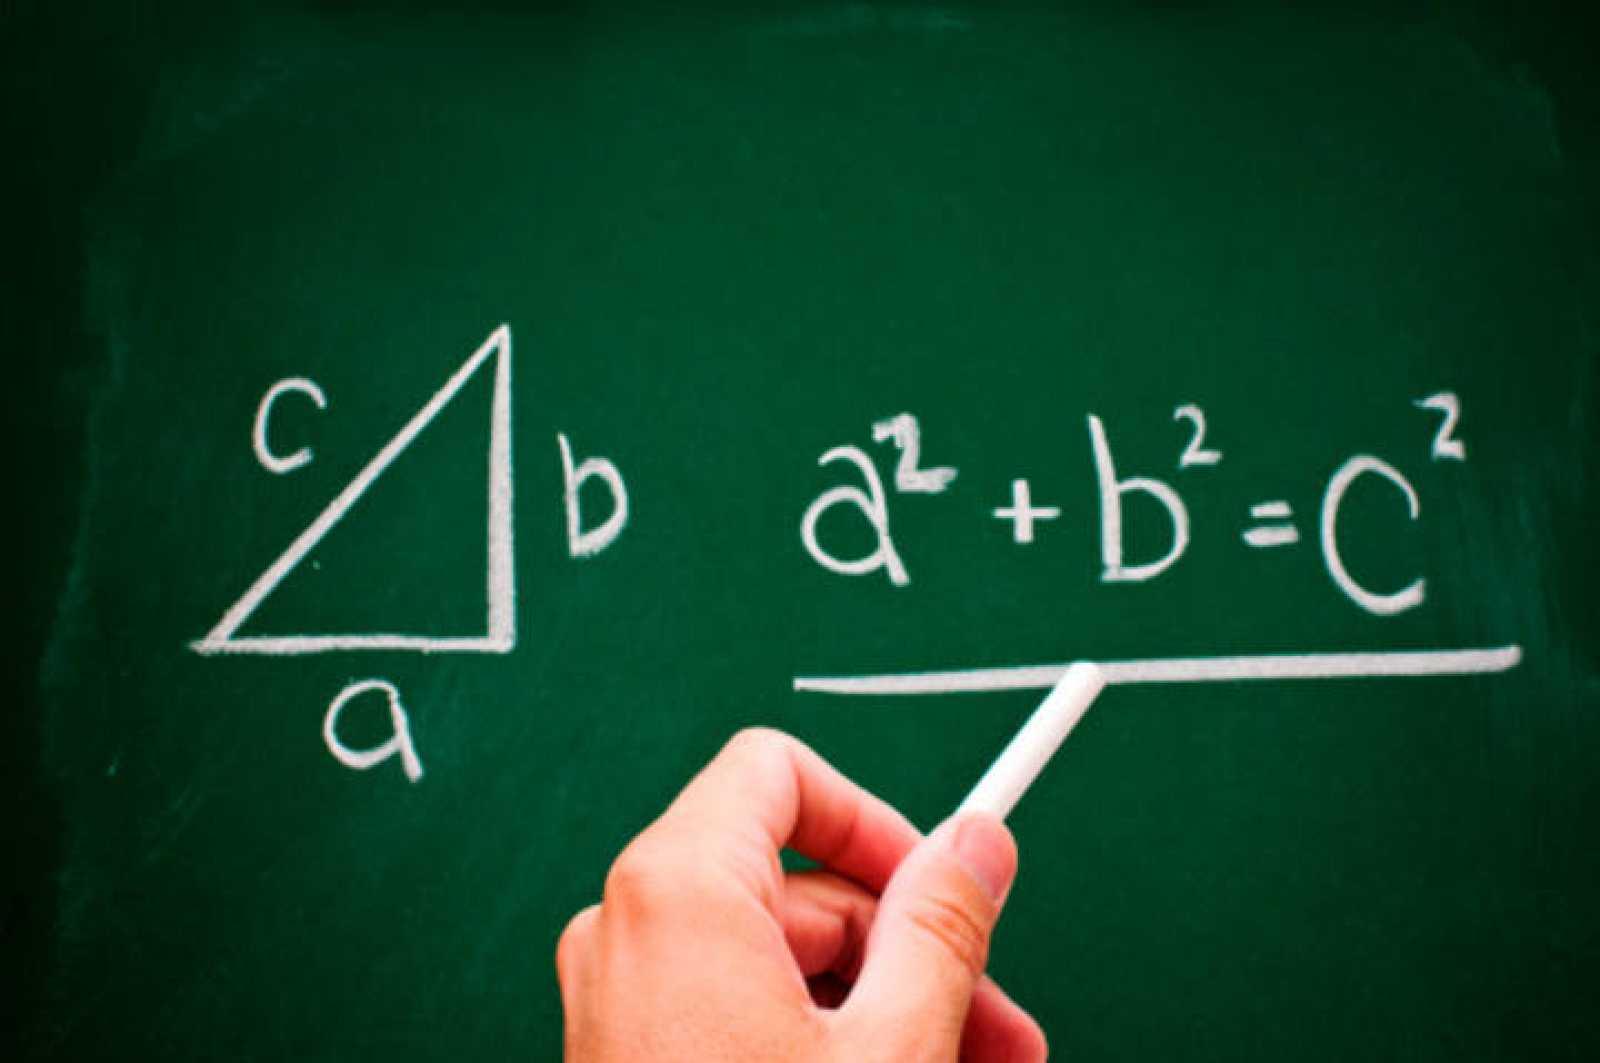 Los profesores de matemáticas creen que en España no se está enseñando bien a resolver problemas.